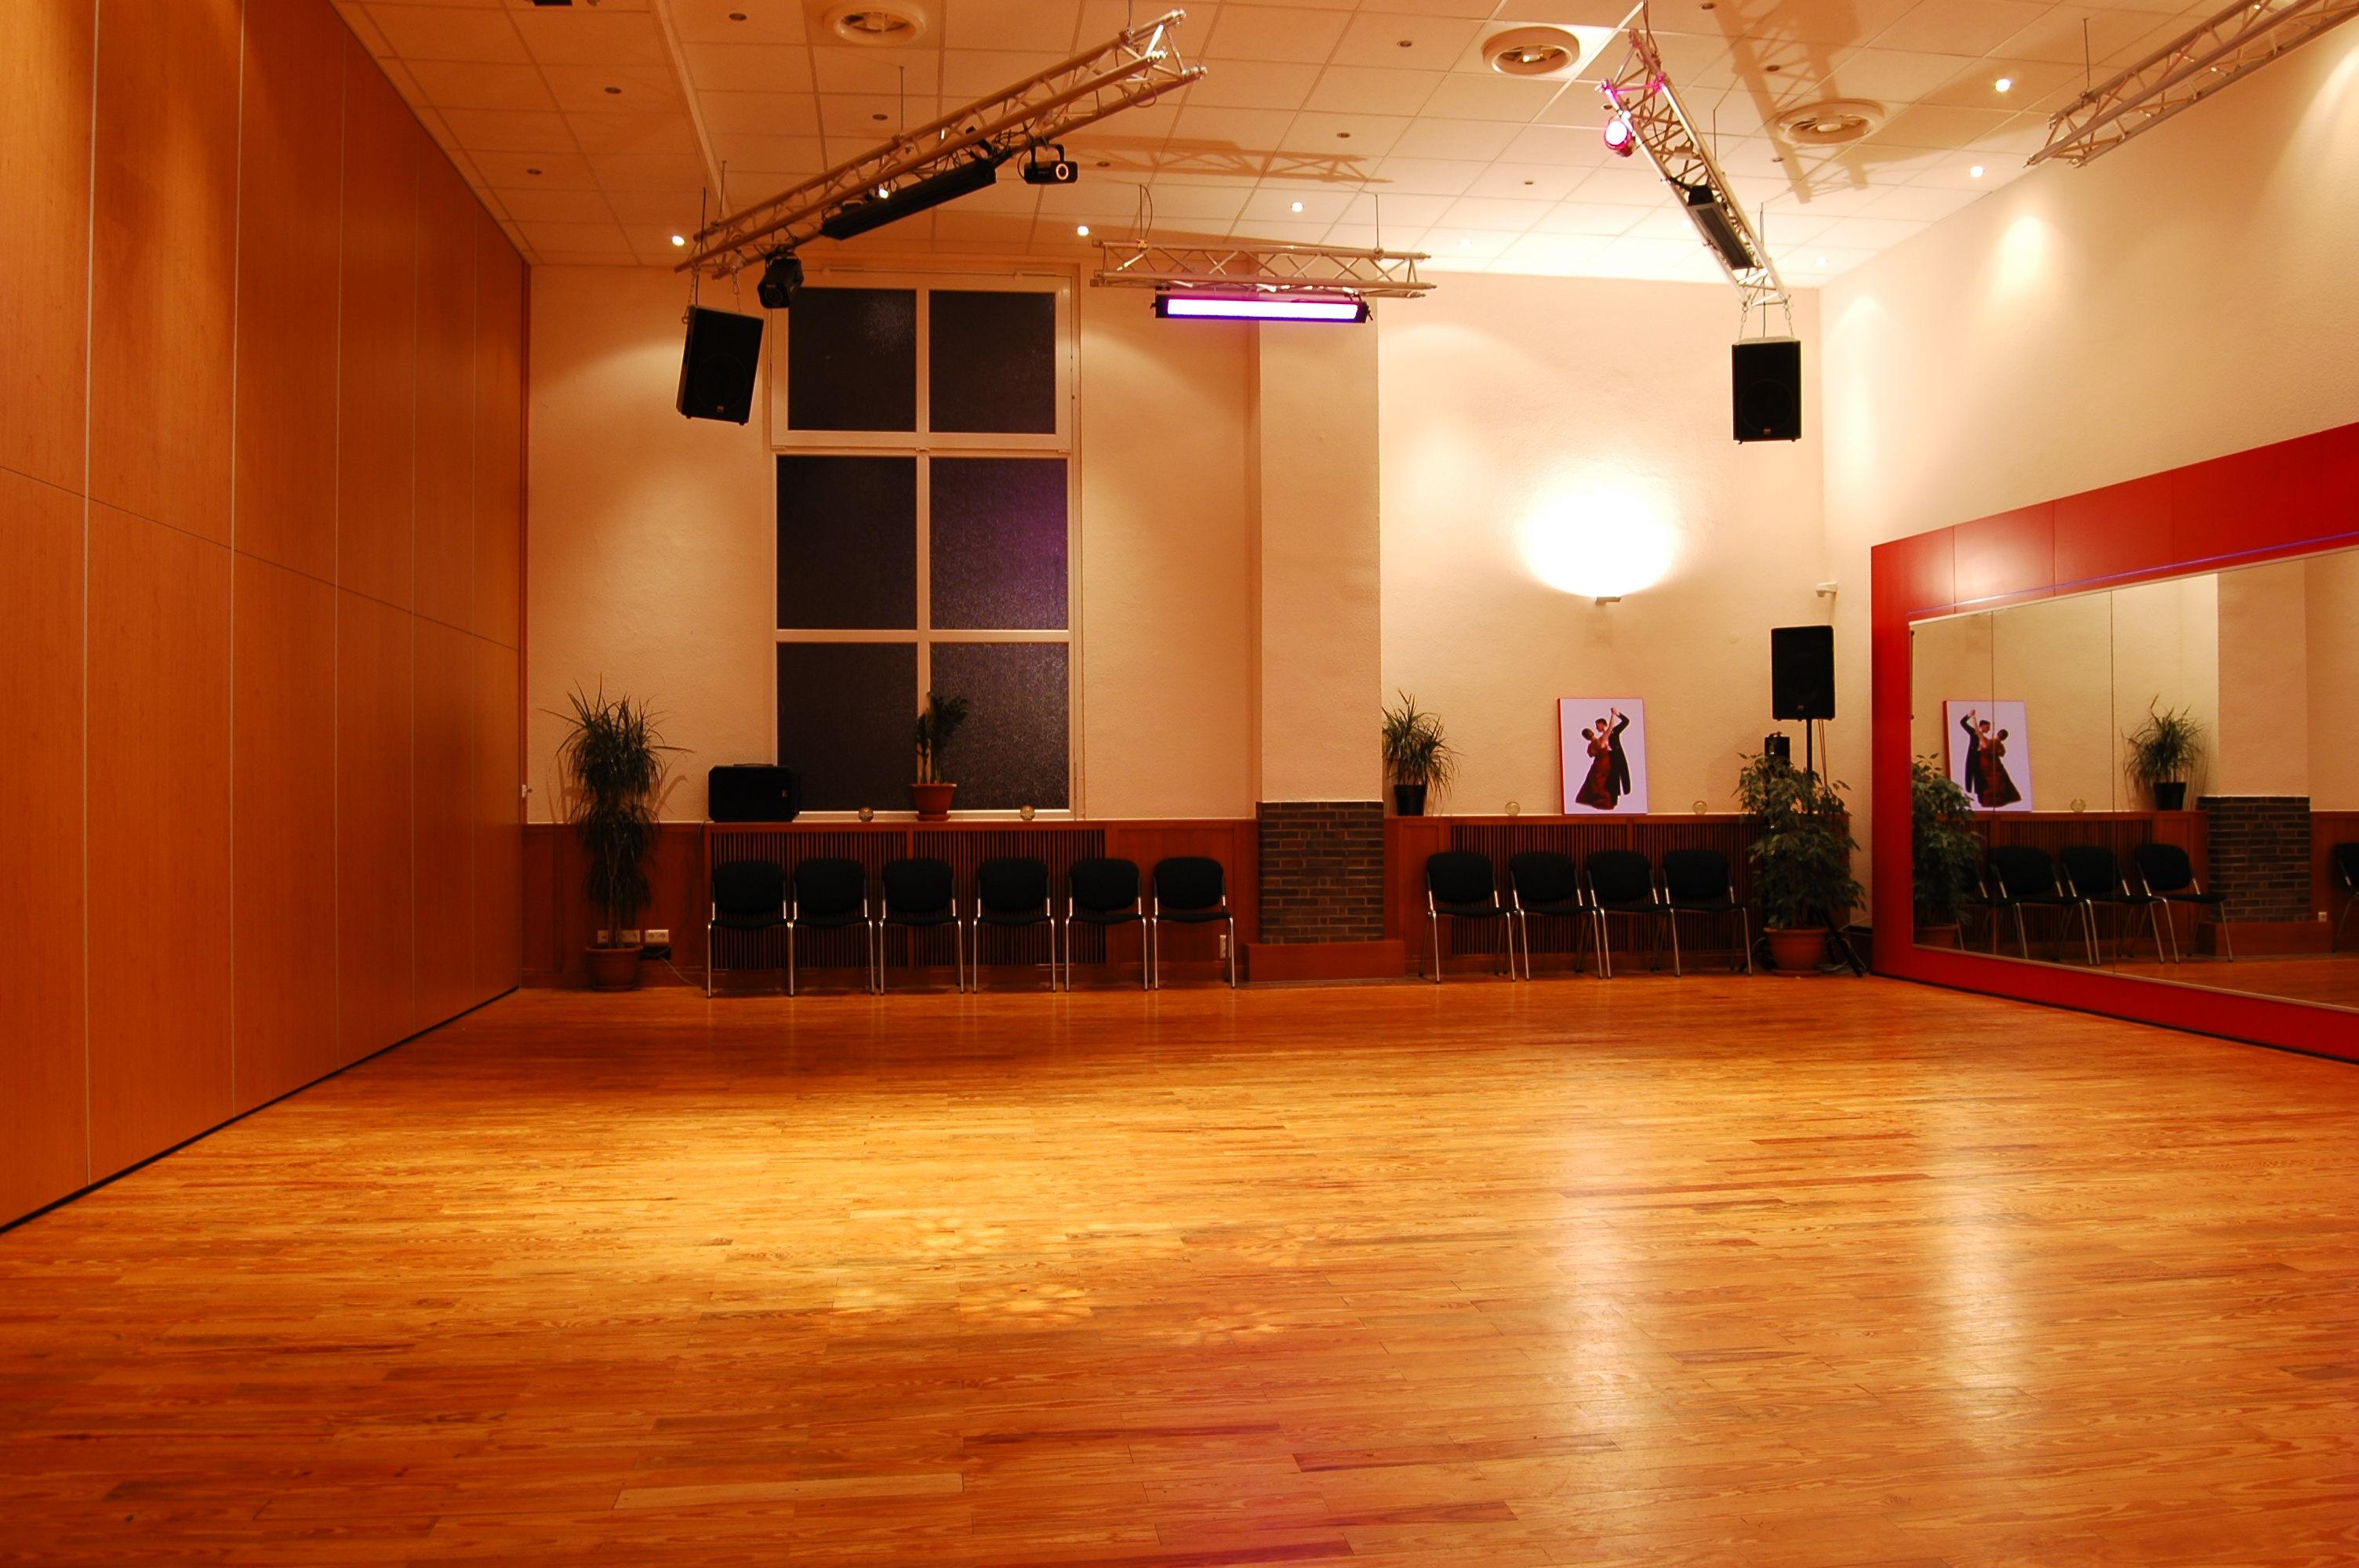 Blick in den kleinen Tanzsaal